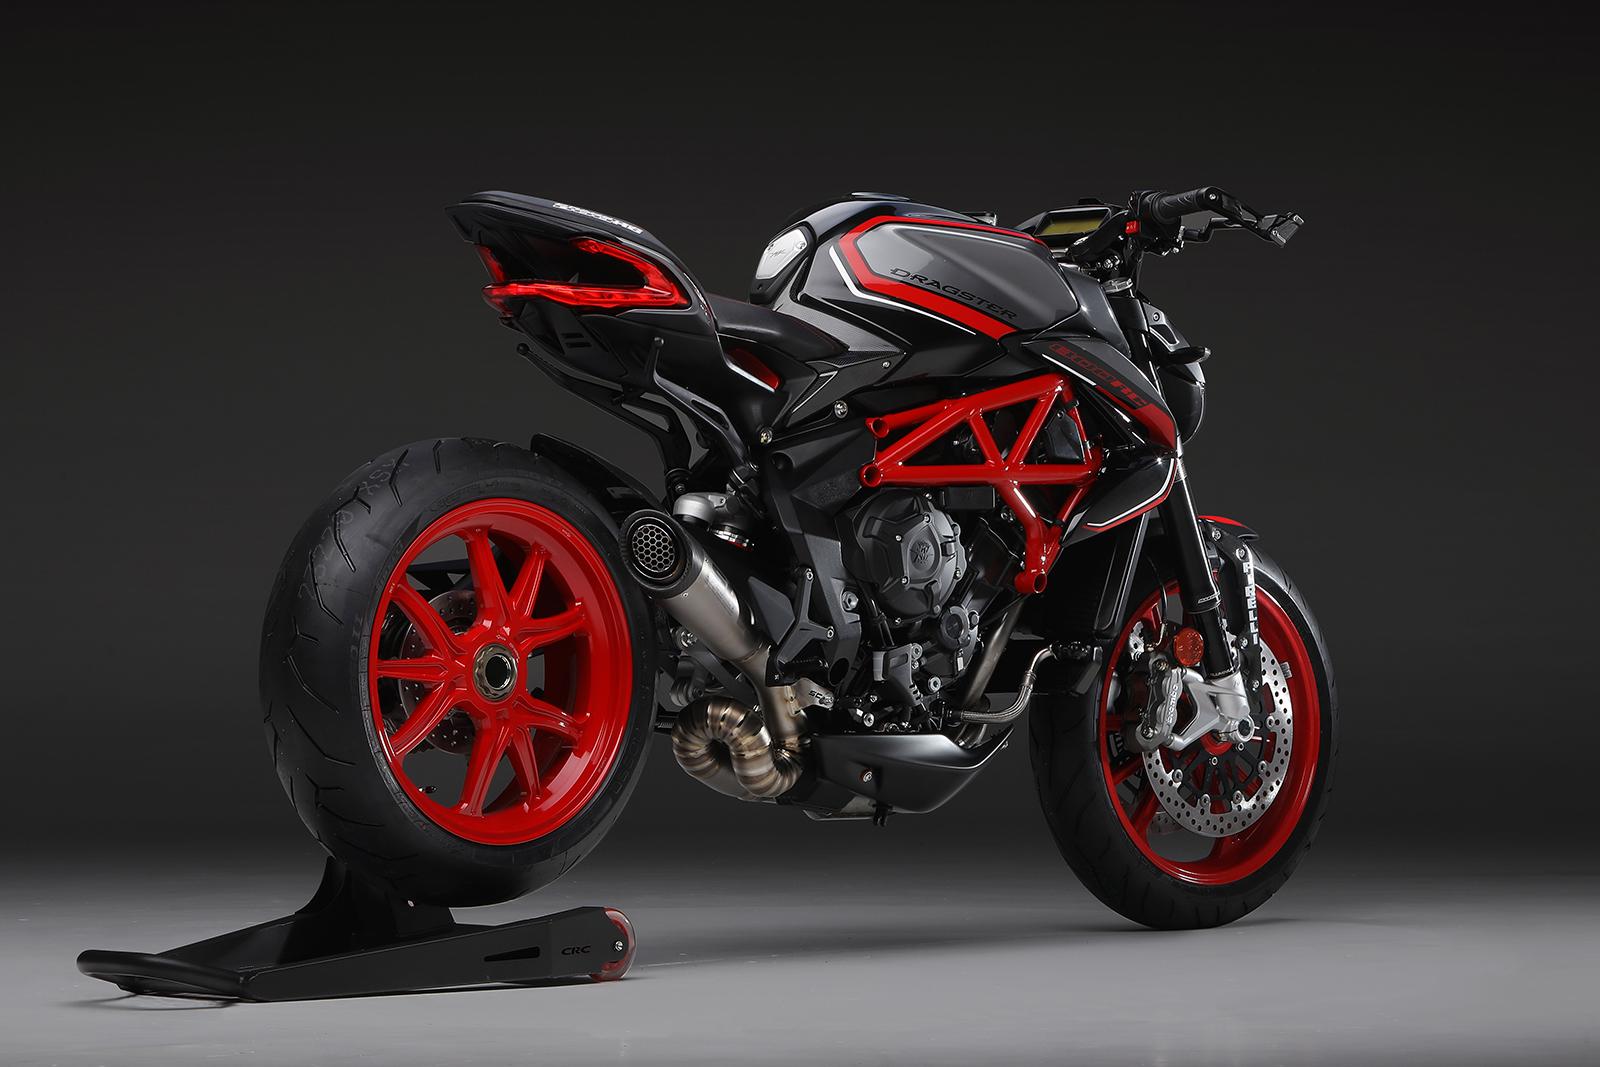 Metallic Avio Grey and Carbon Black / Ago Red